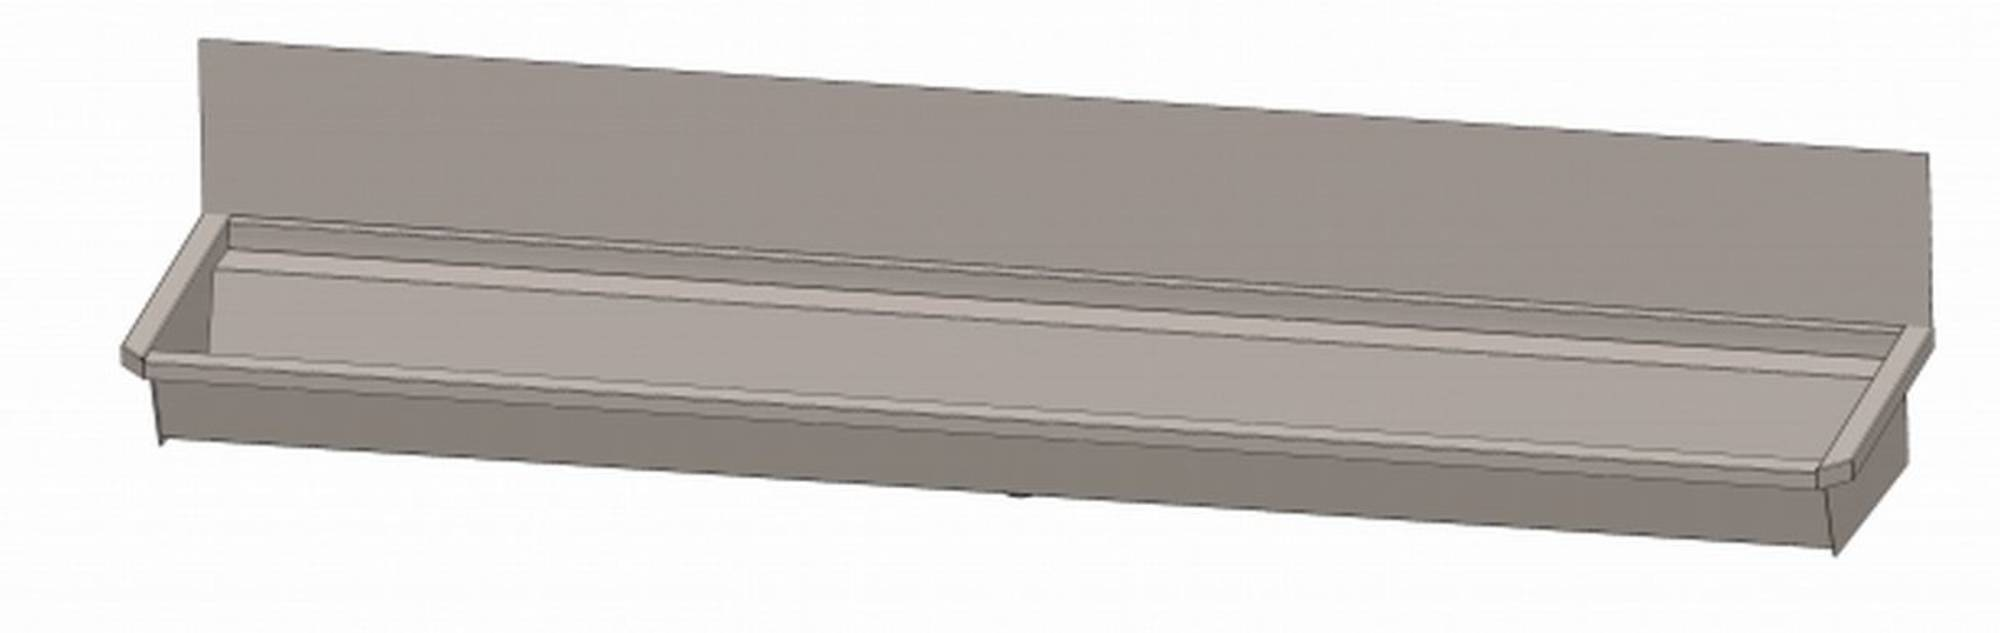 Intersan Sanilav wasgoot met spatbord 240cm 4-perszonder leiding Inox 304